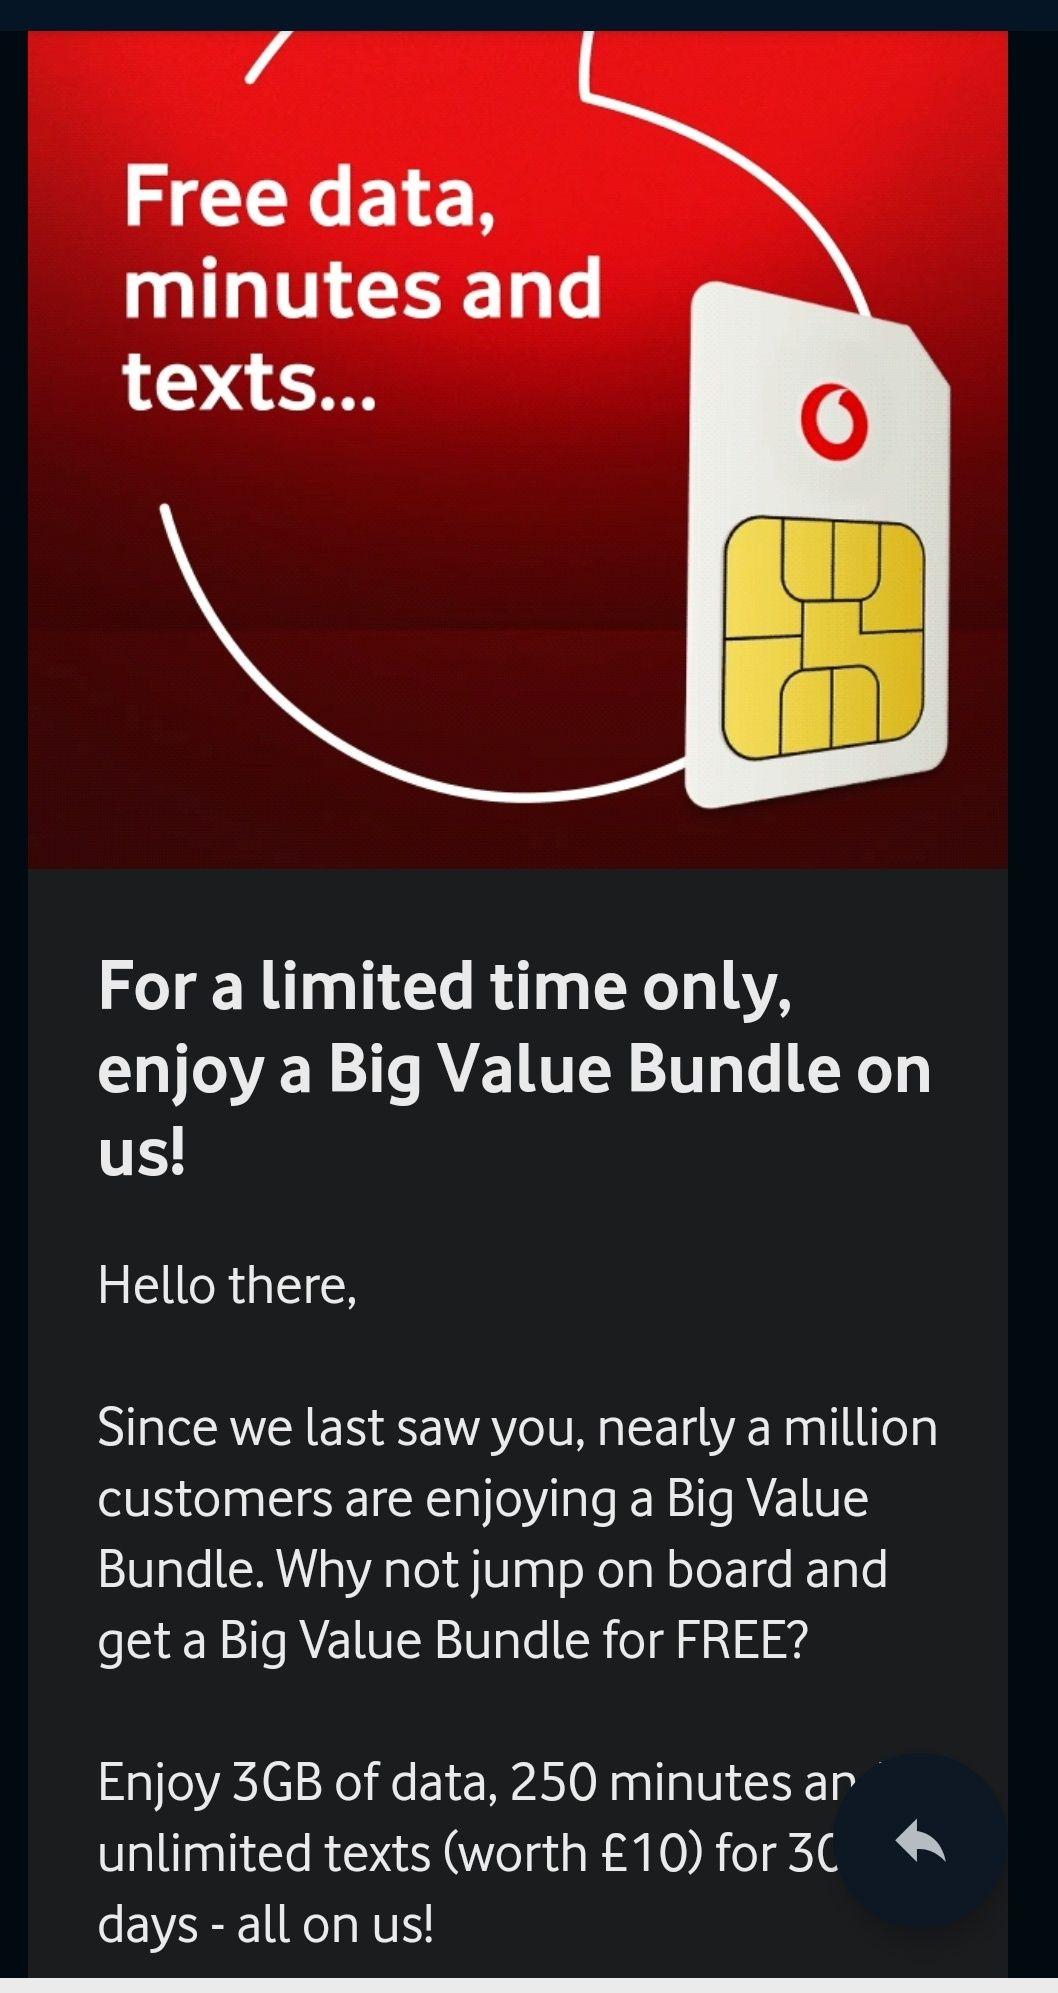 Vodafone - free Big Value bundle worth £10, existing customers